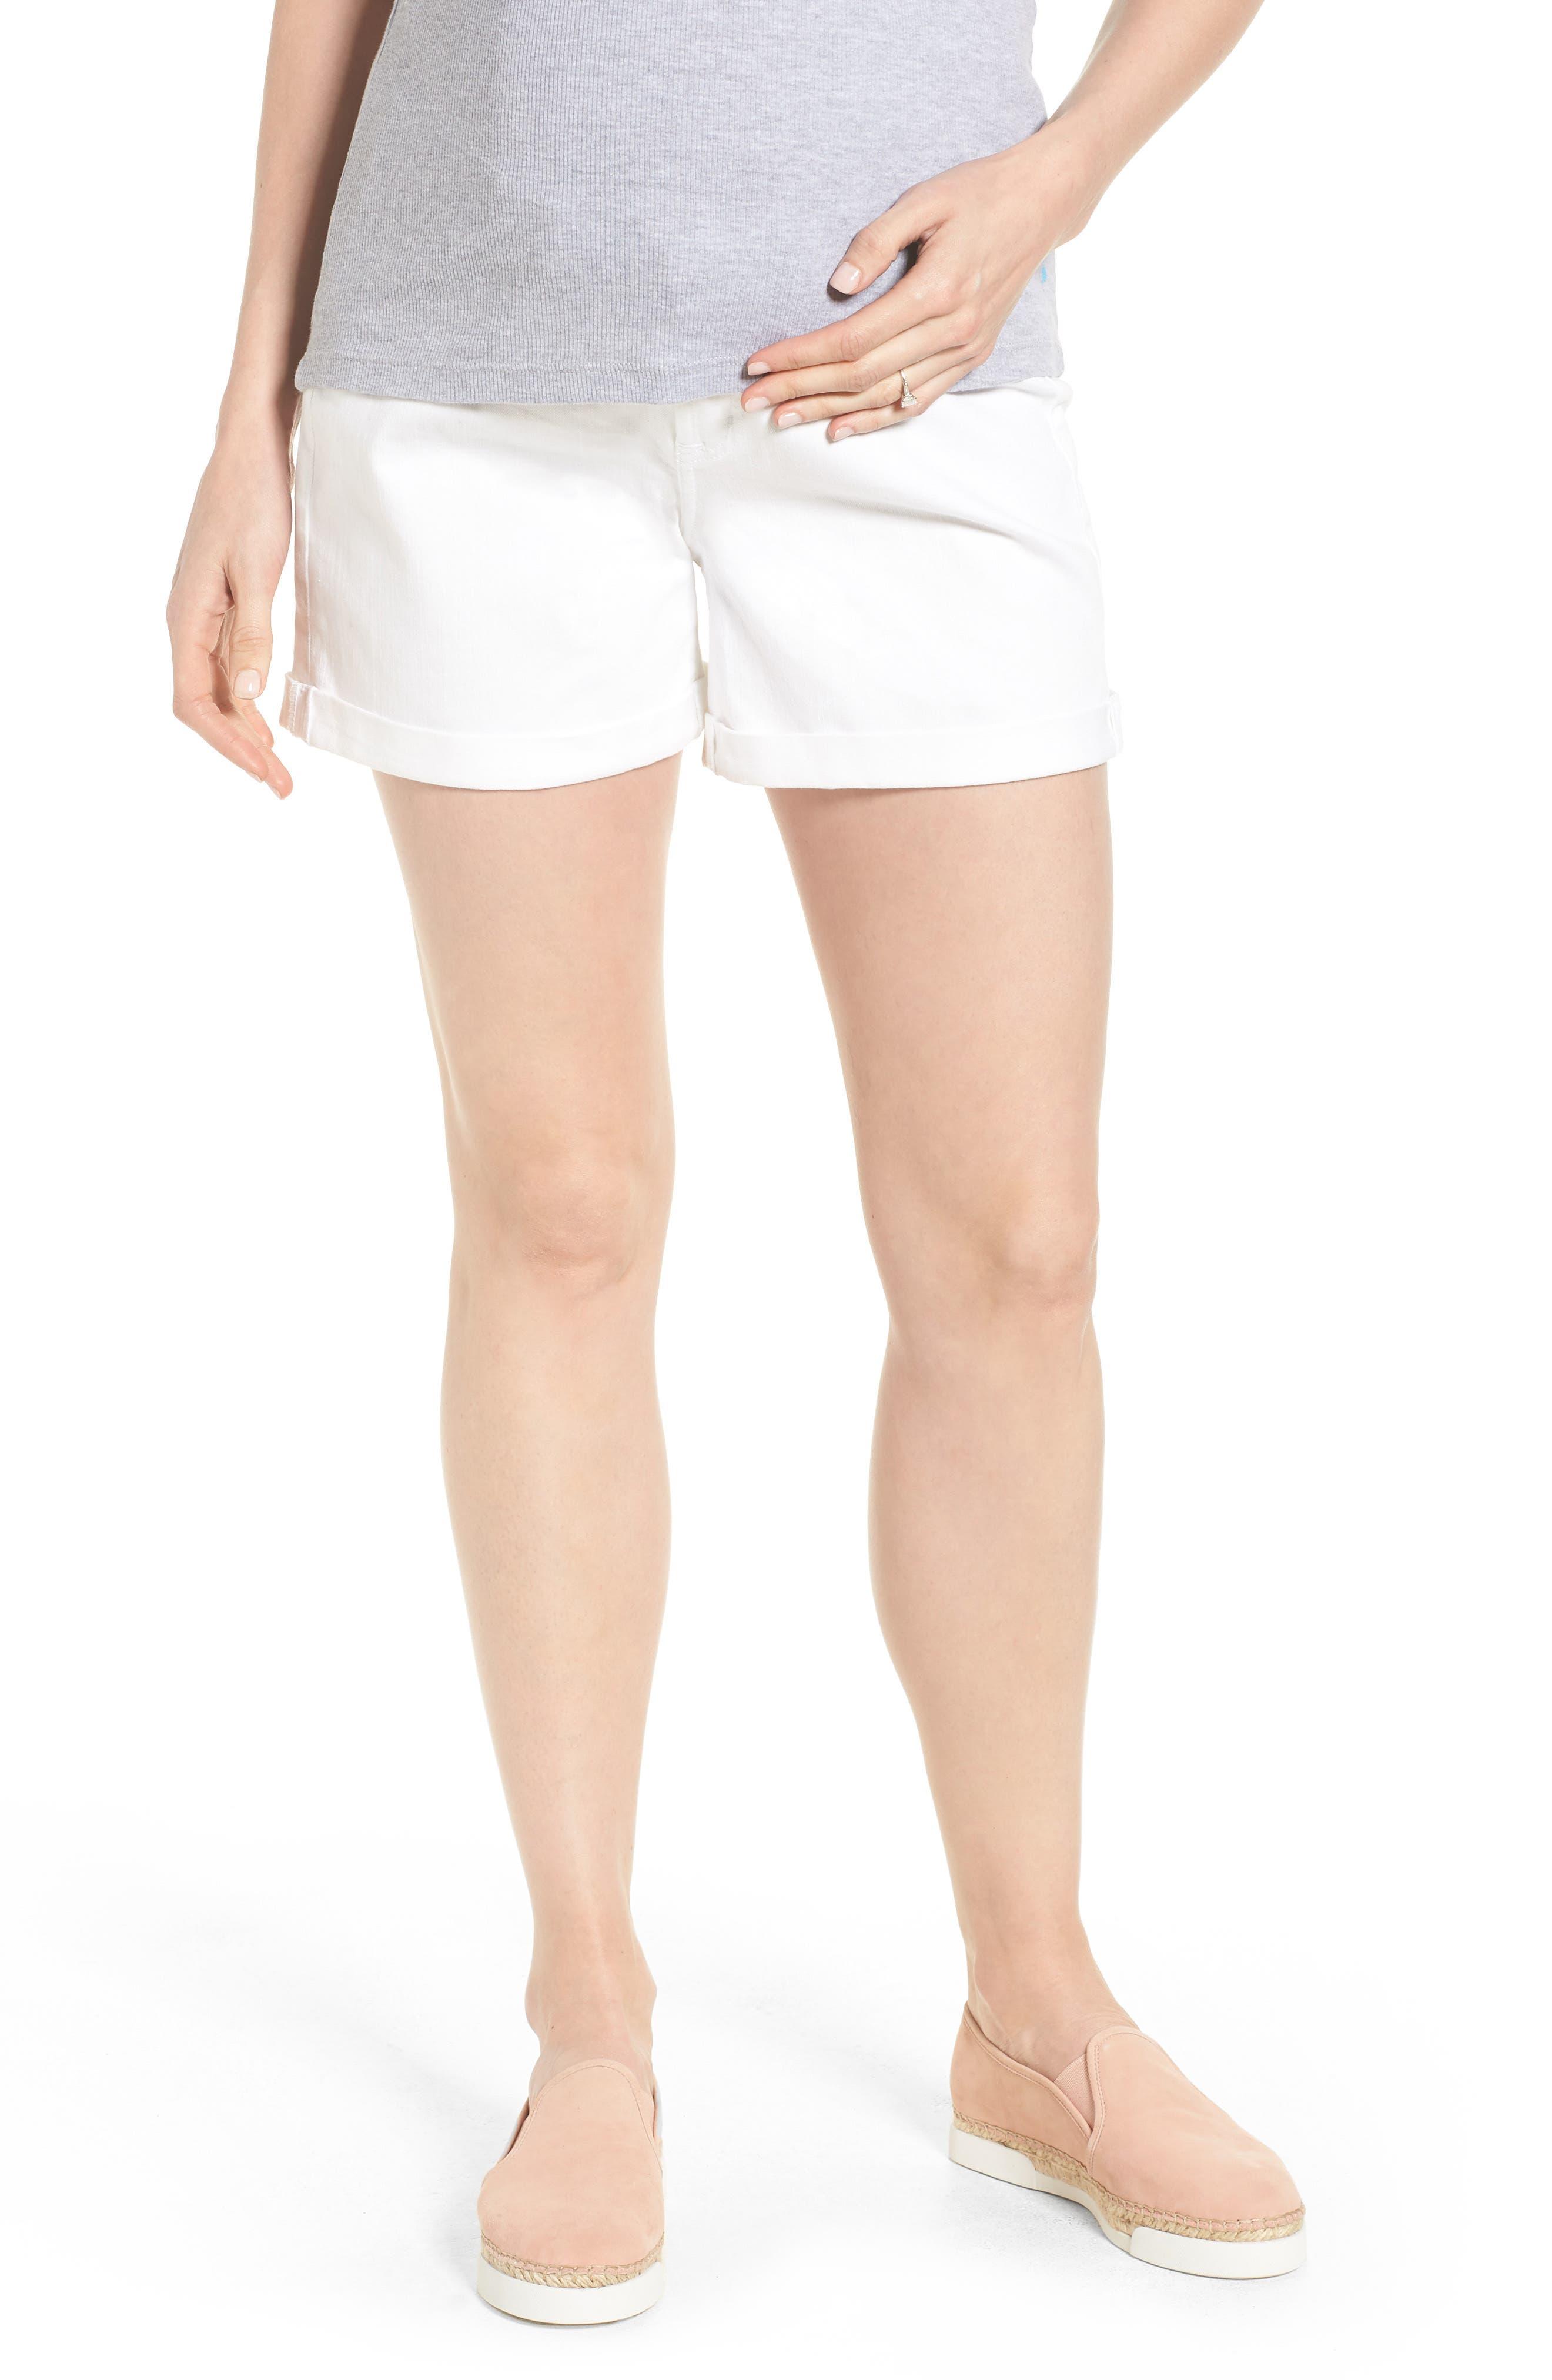 Mia Maternity Boyfriend Shorts,                             Main thumbnail 1, color,                             White